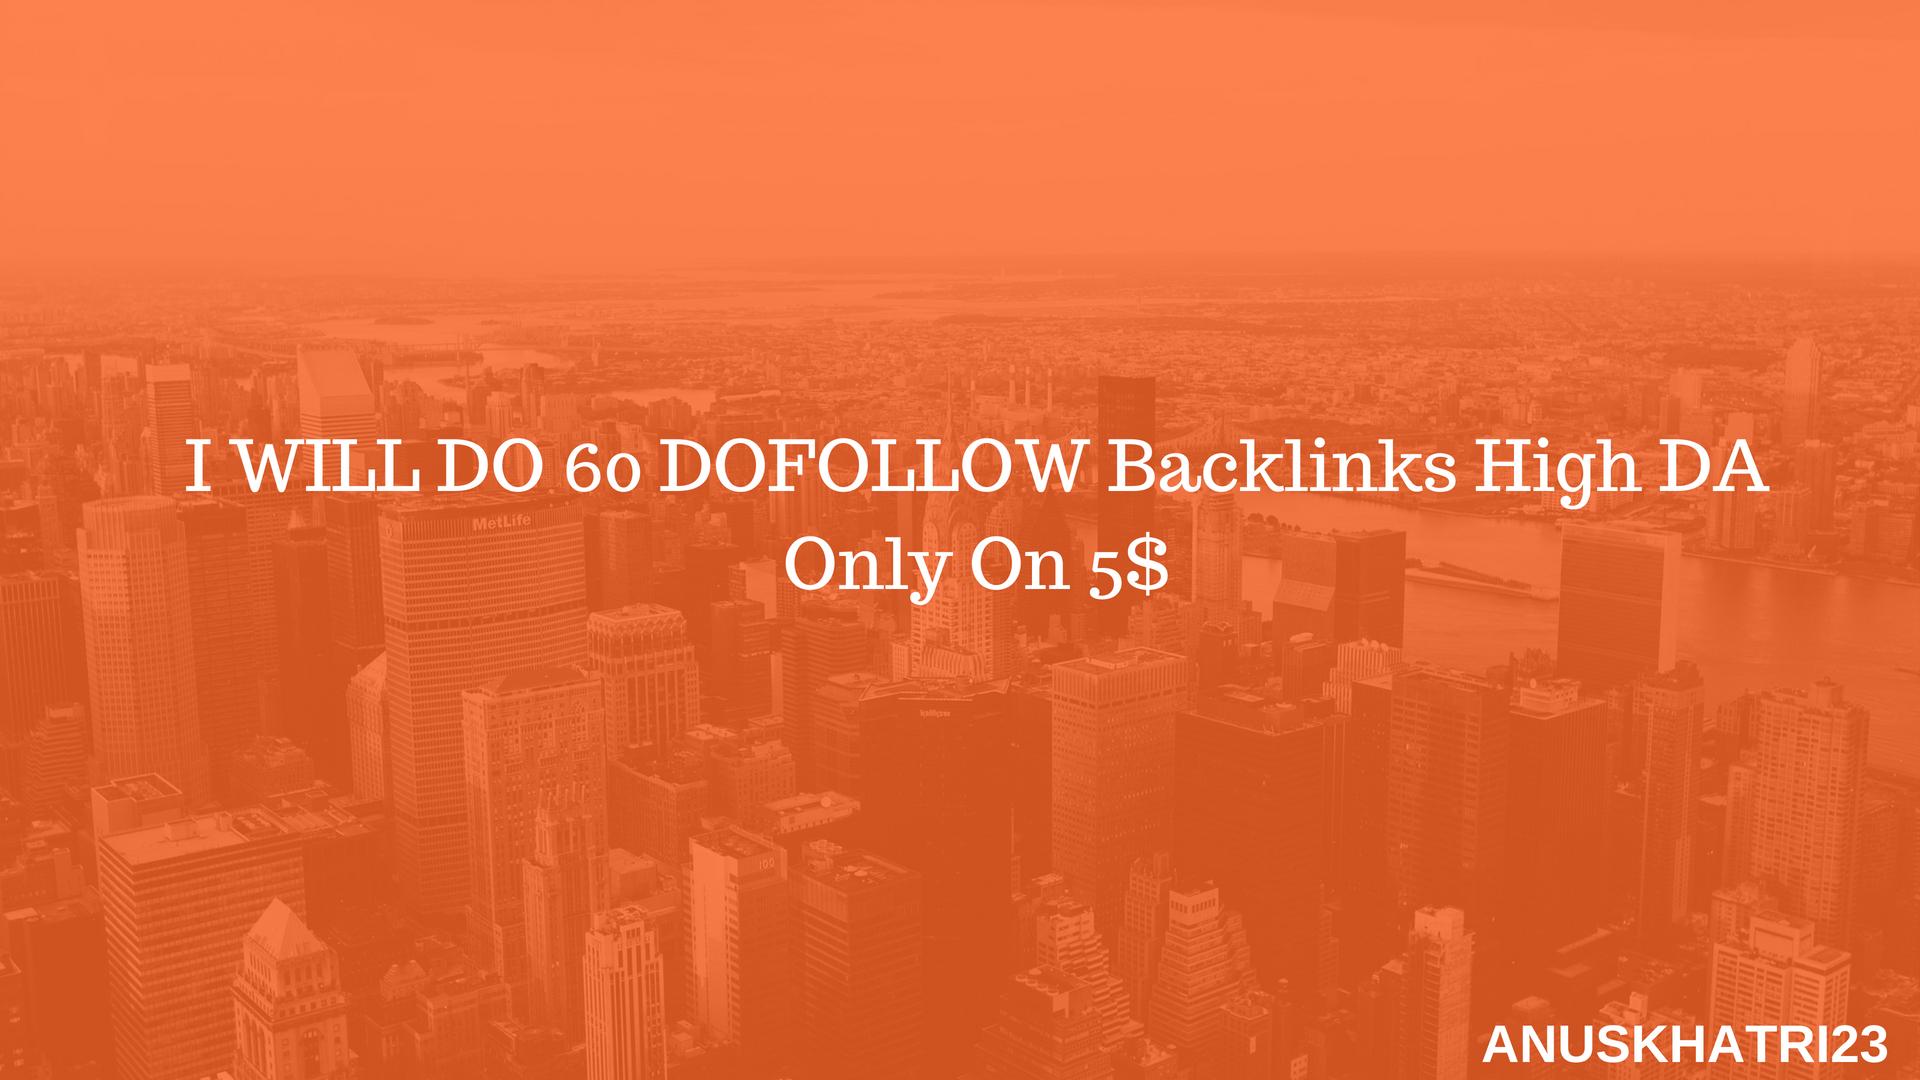 Do 60 Manual Do Follow Blog Commenting